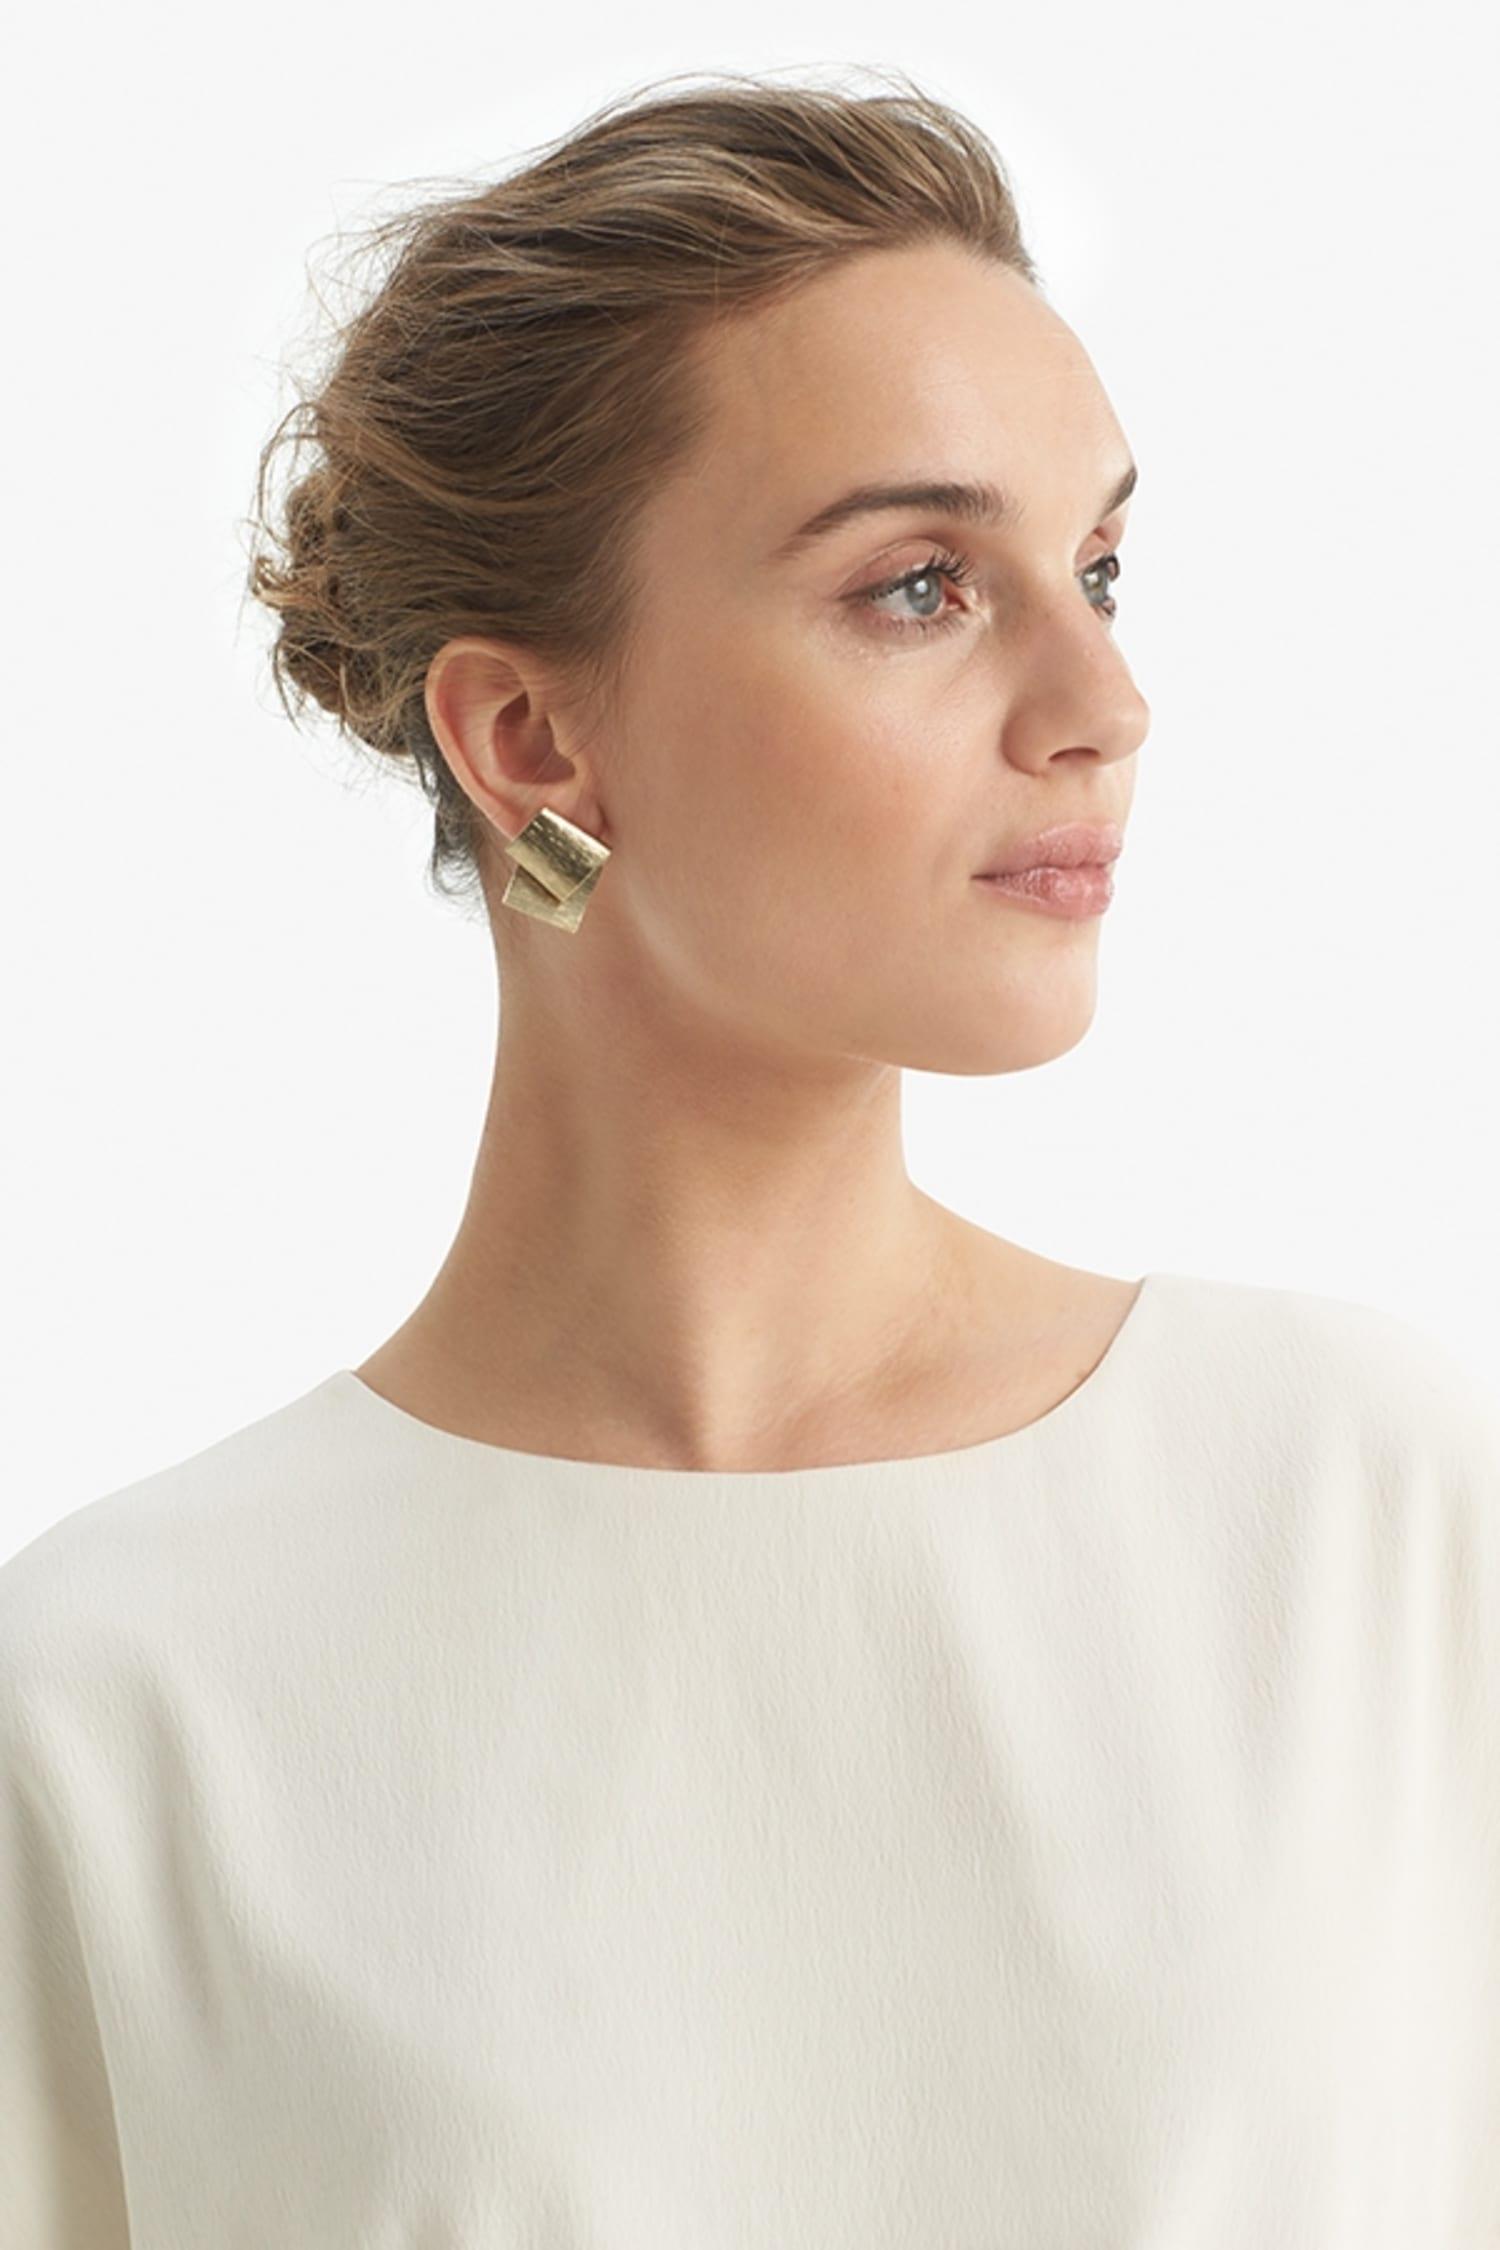 ad4b69ca221ff The Velma Earrings